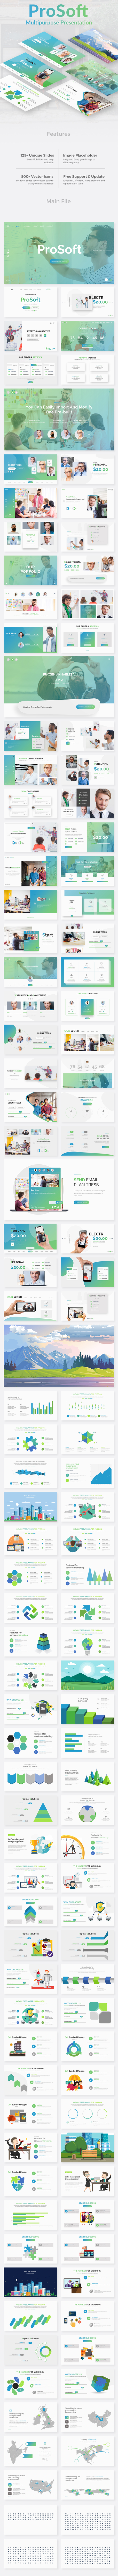 ProSoft Business Multipurpose Google Slide Template - Google Slides Presentation Templates